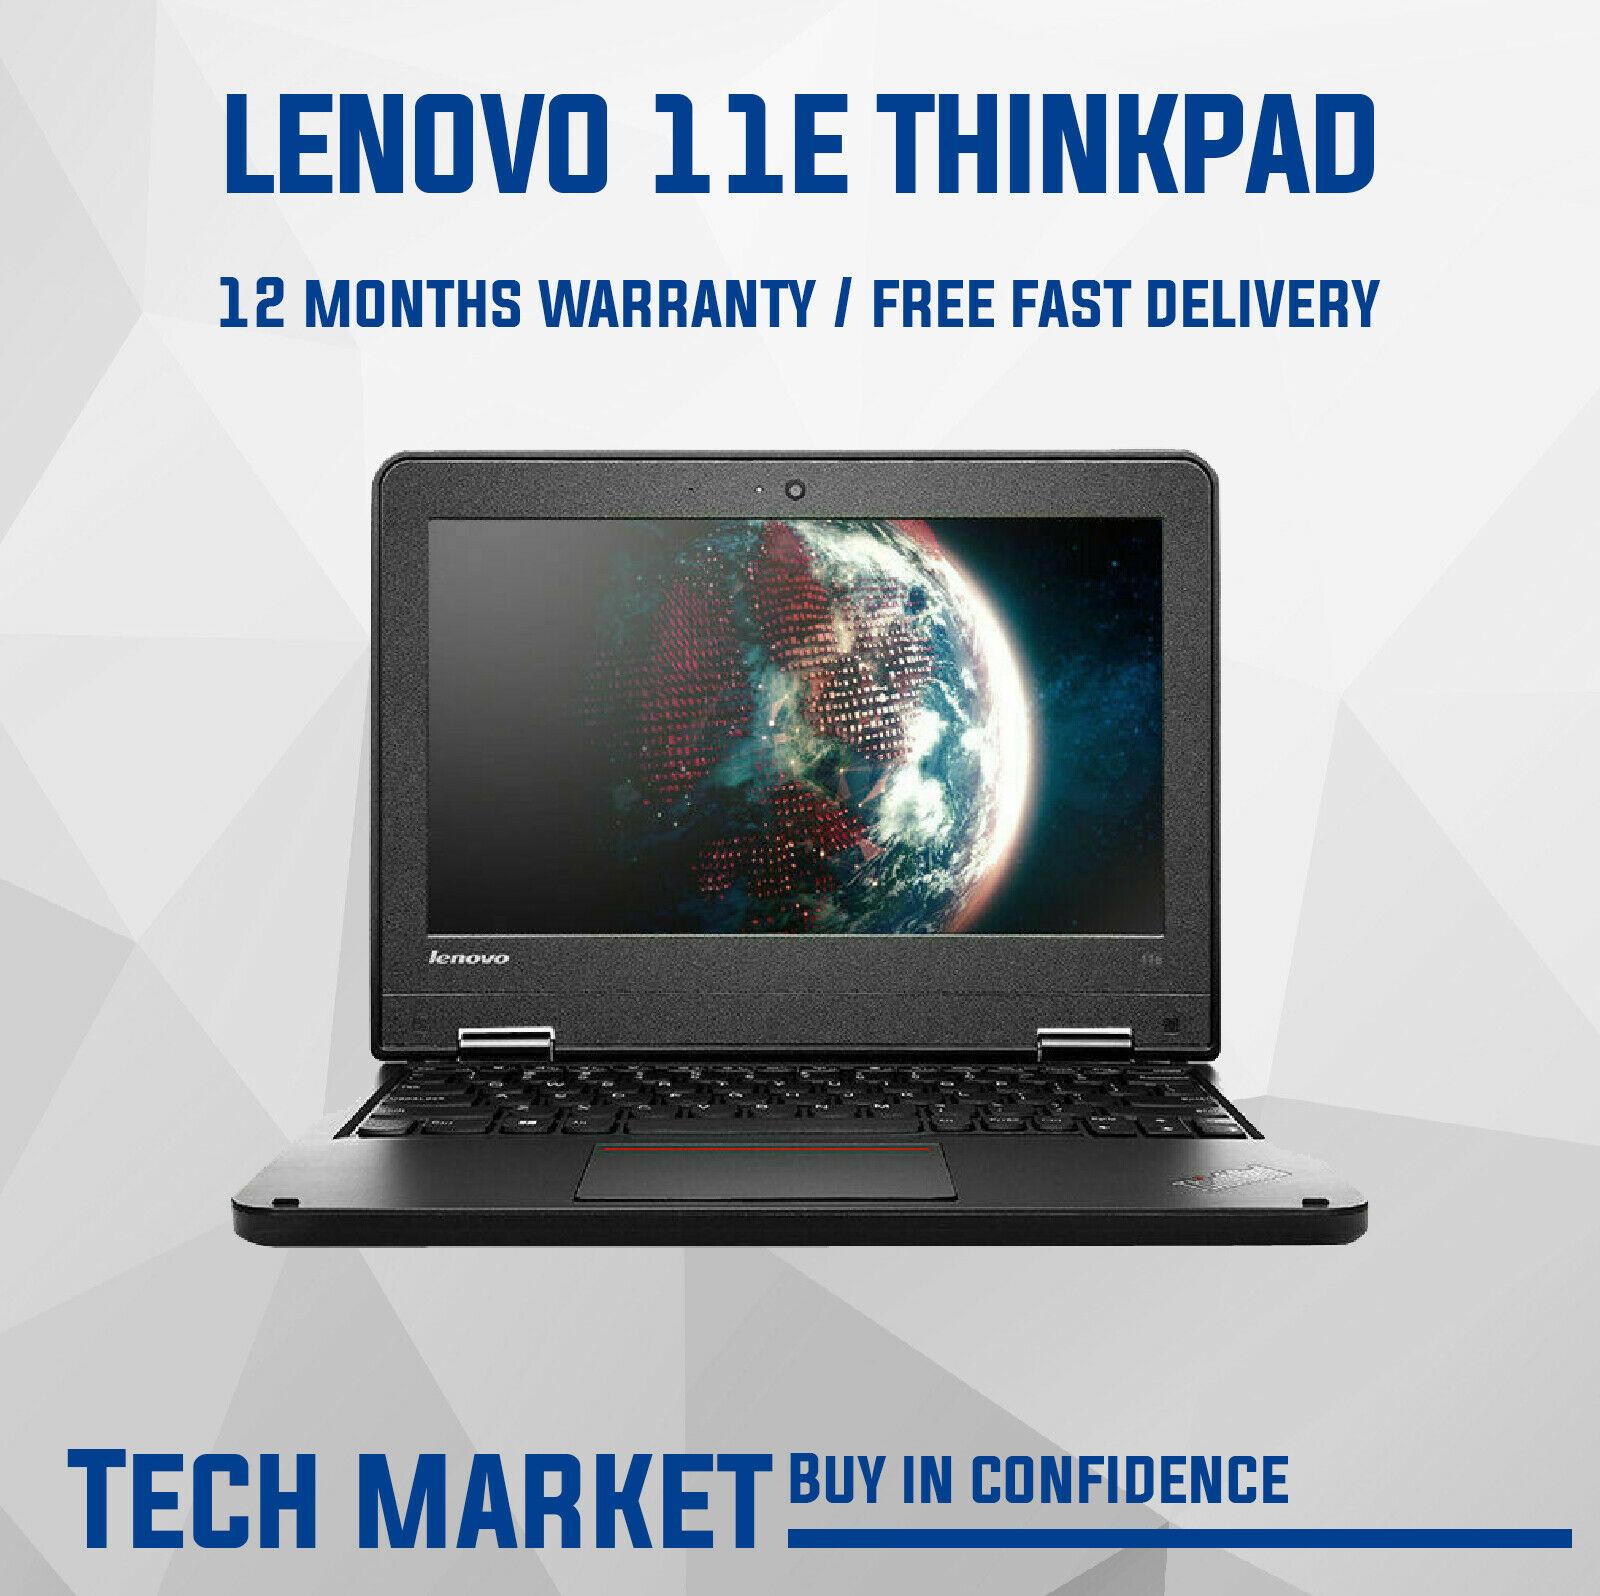 "Refurbished LENOVO THINKPAD 11E 11.6"" (3RD GEN) CHEAP WINDOWS LAPTOP 8GB RAM 128GB SSD - £143.99 @ eBay / techmarket-deals"